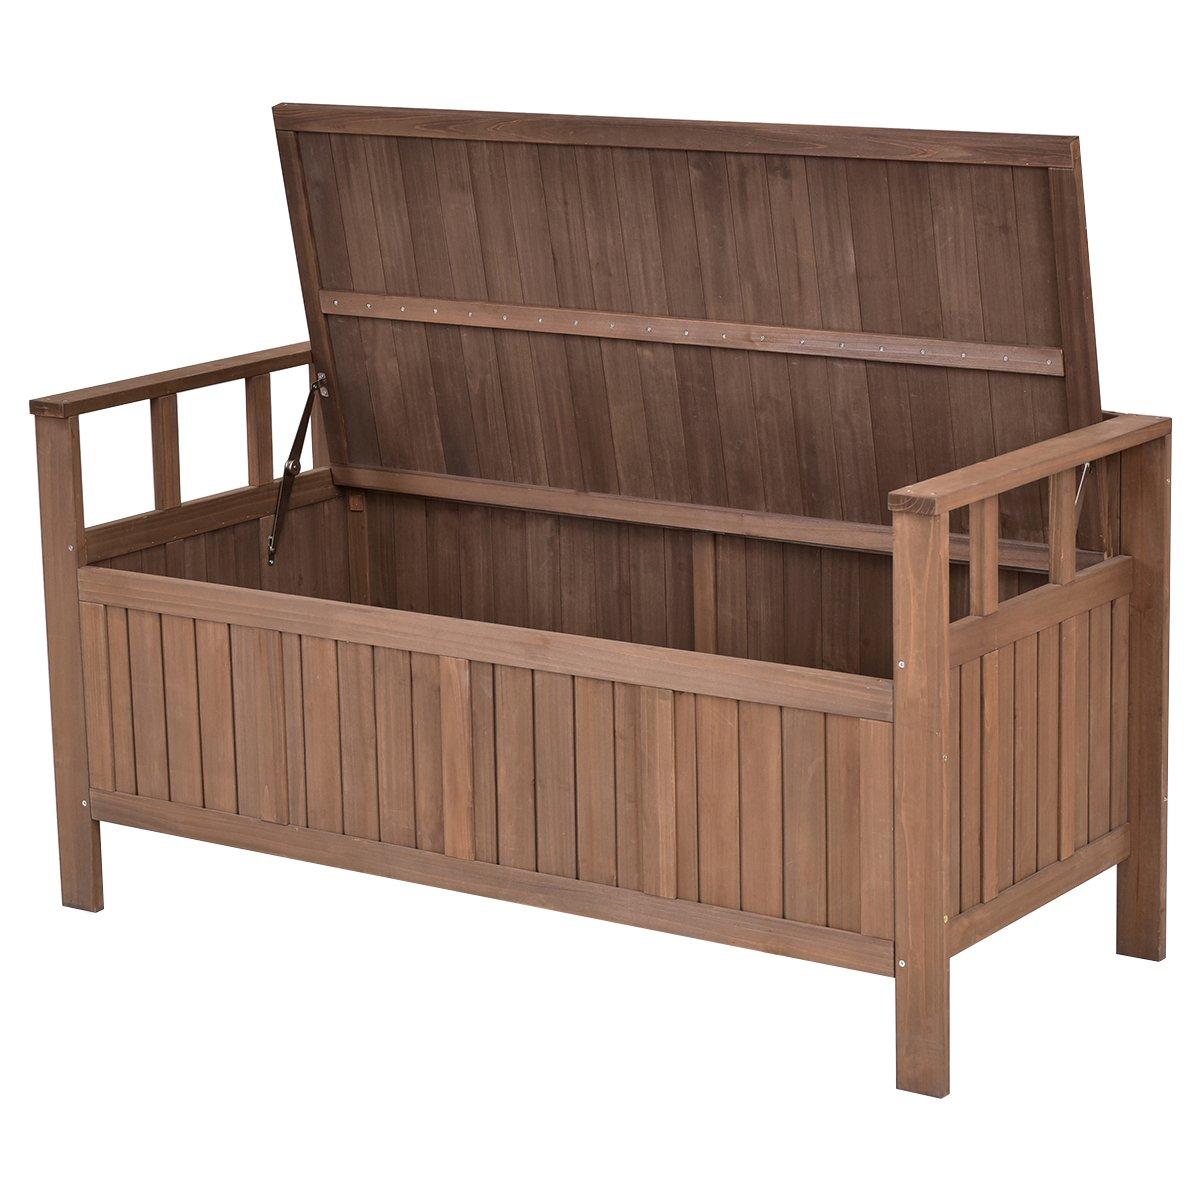 Giantex 70 Gallon Storage Bench All Weather Outdoor Patio Storage Garden Bench Deck Box